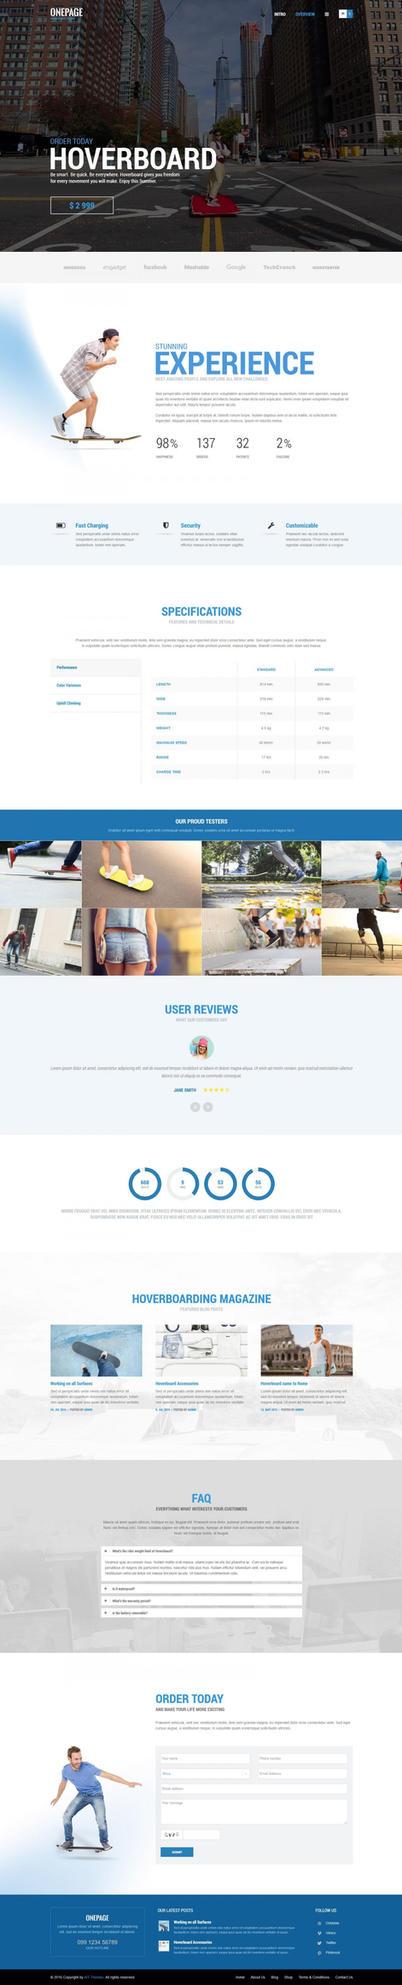 OnePage WordPress Theme by ait-themes